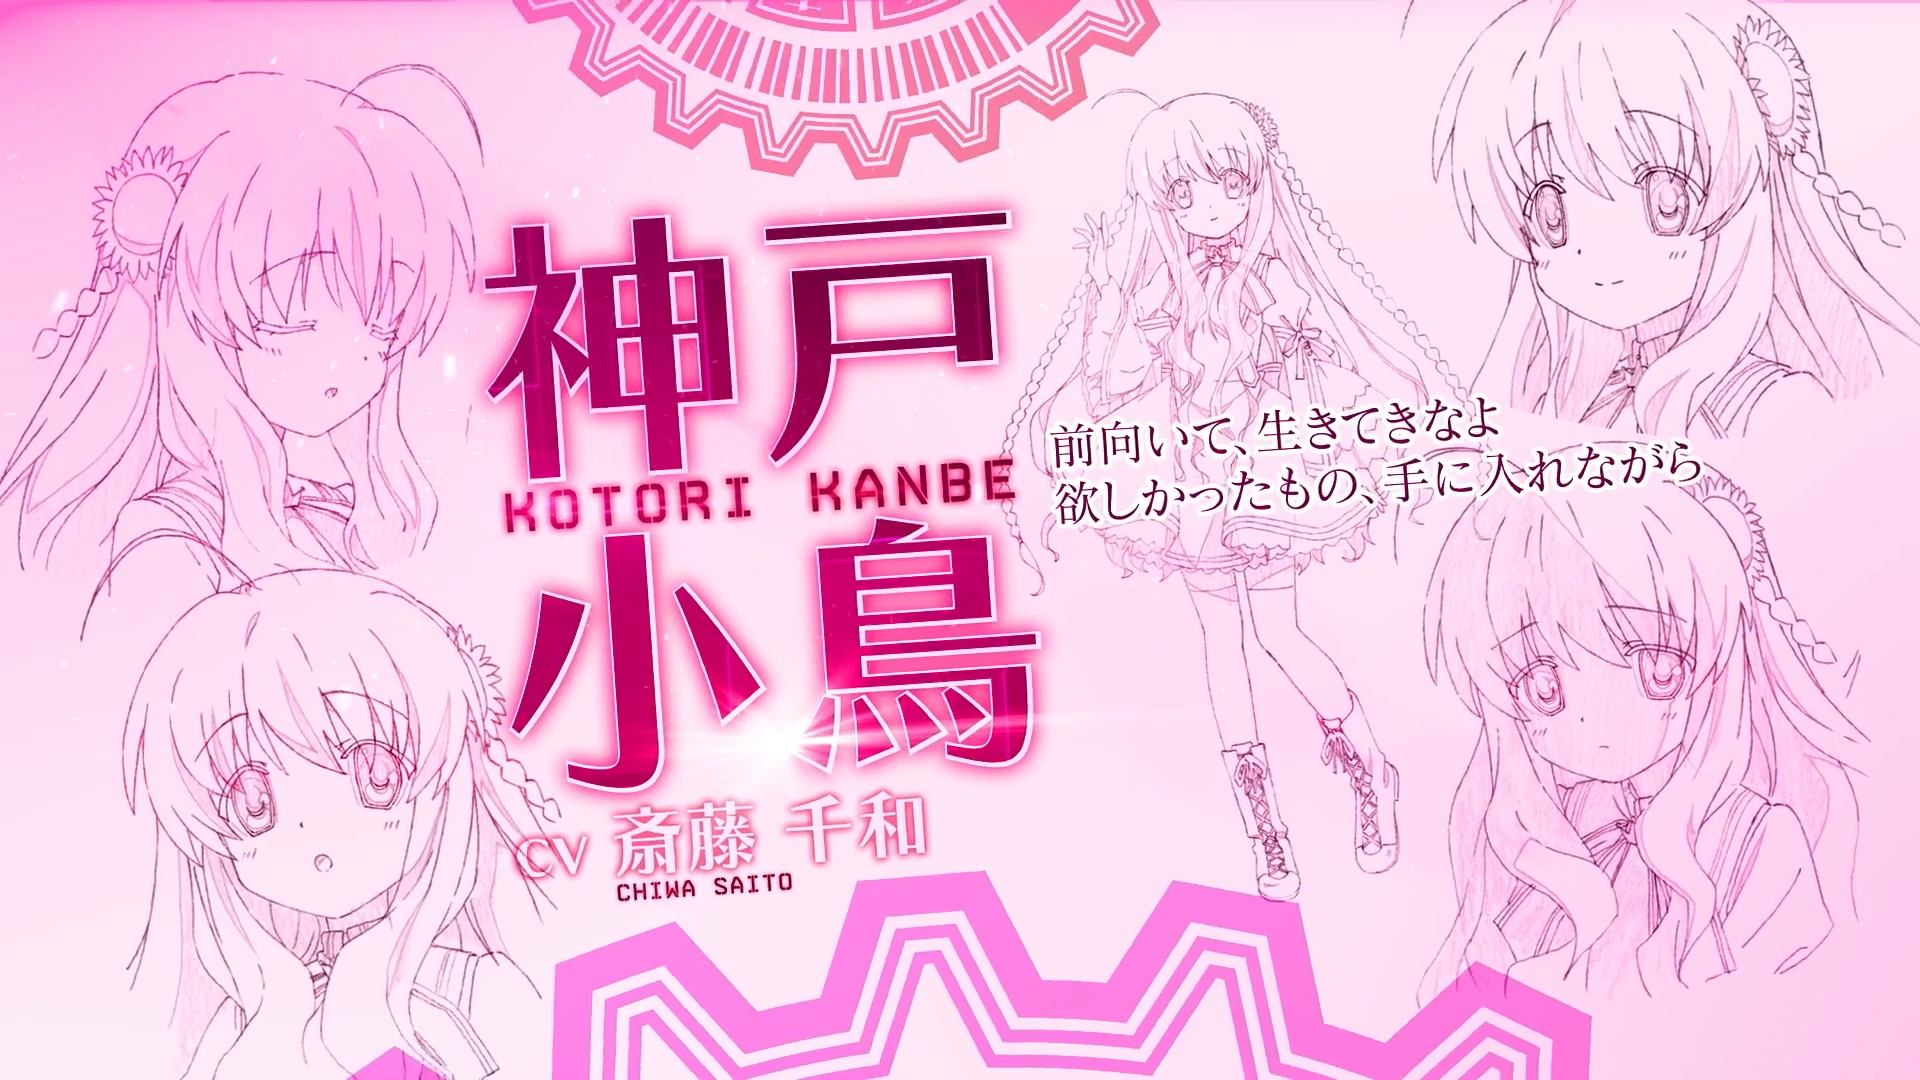 Rewrite-anime151229a.jpg